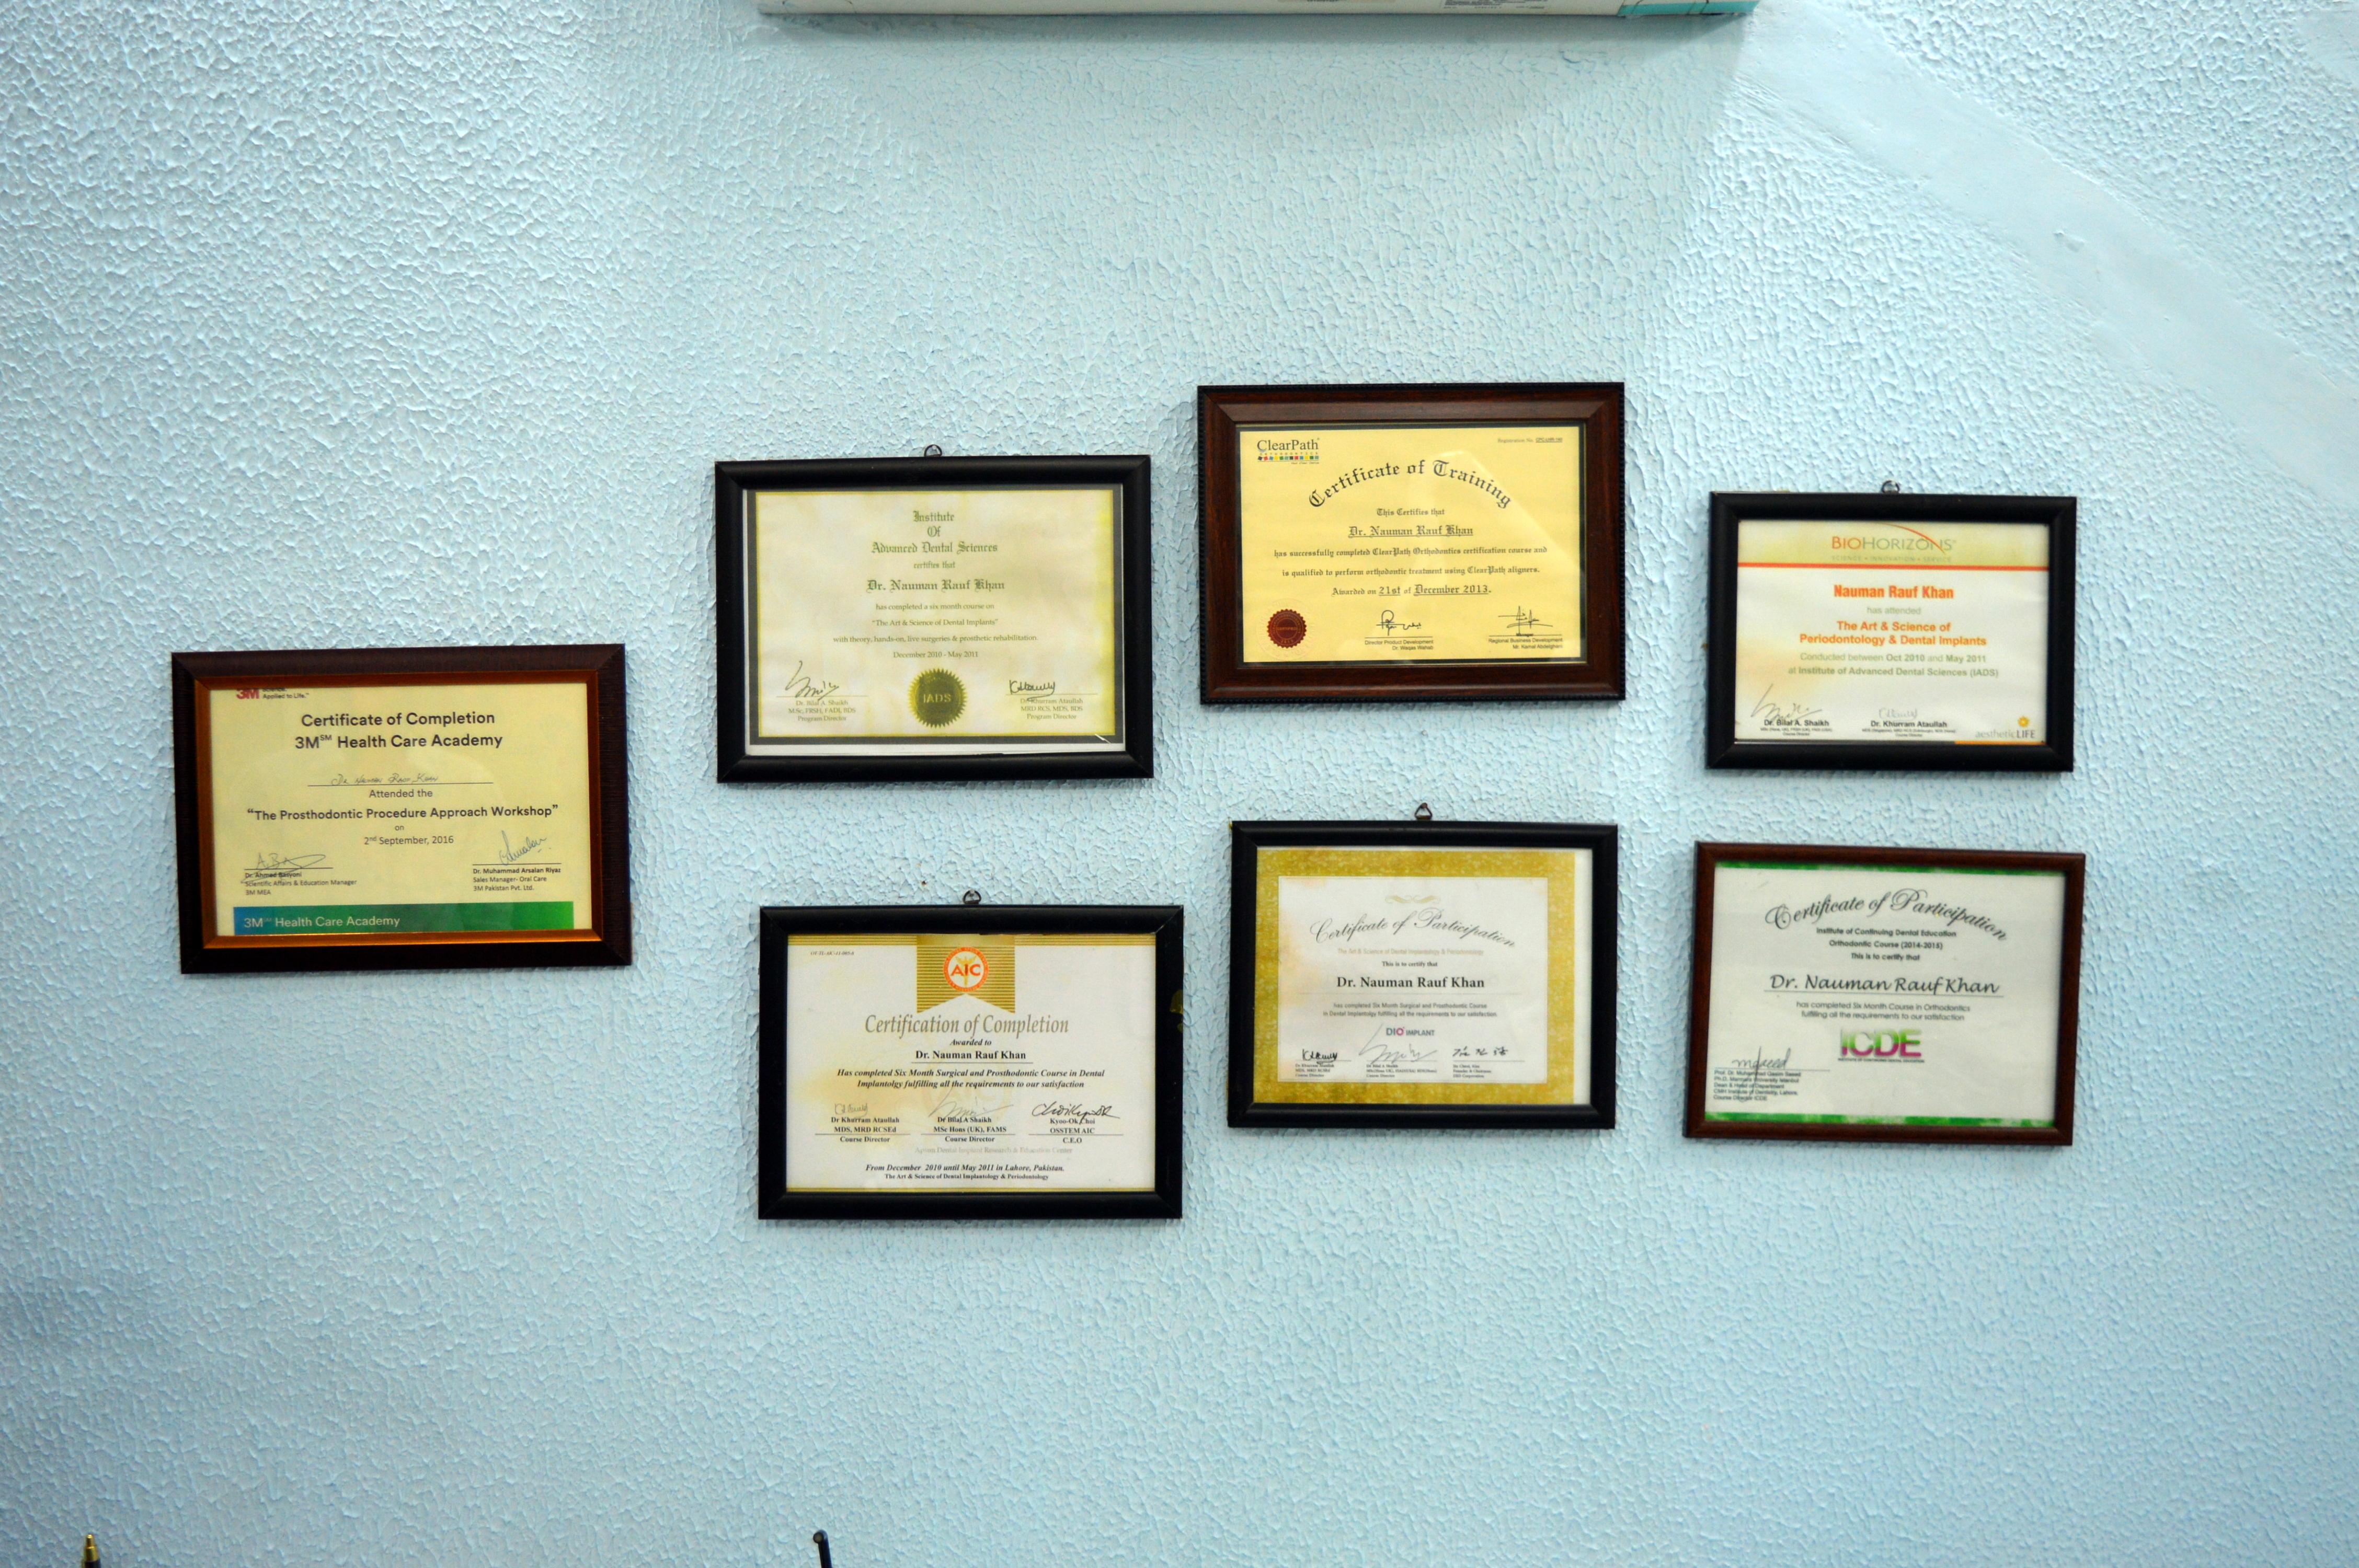 Dr nauman   associates dentist